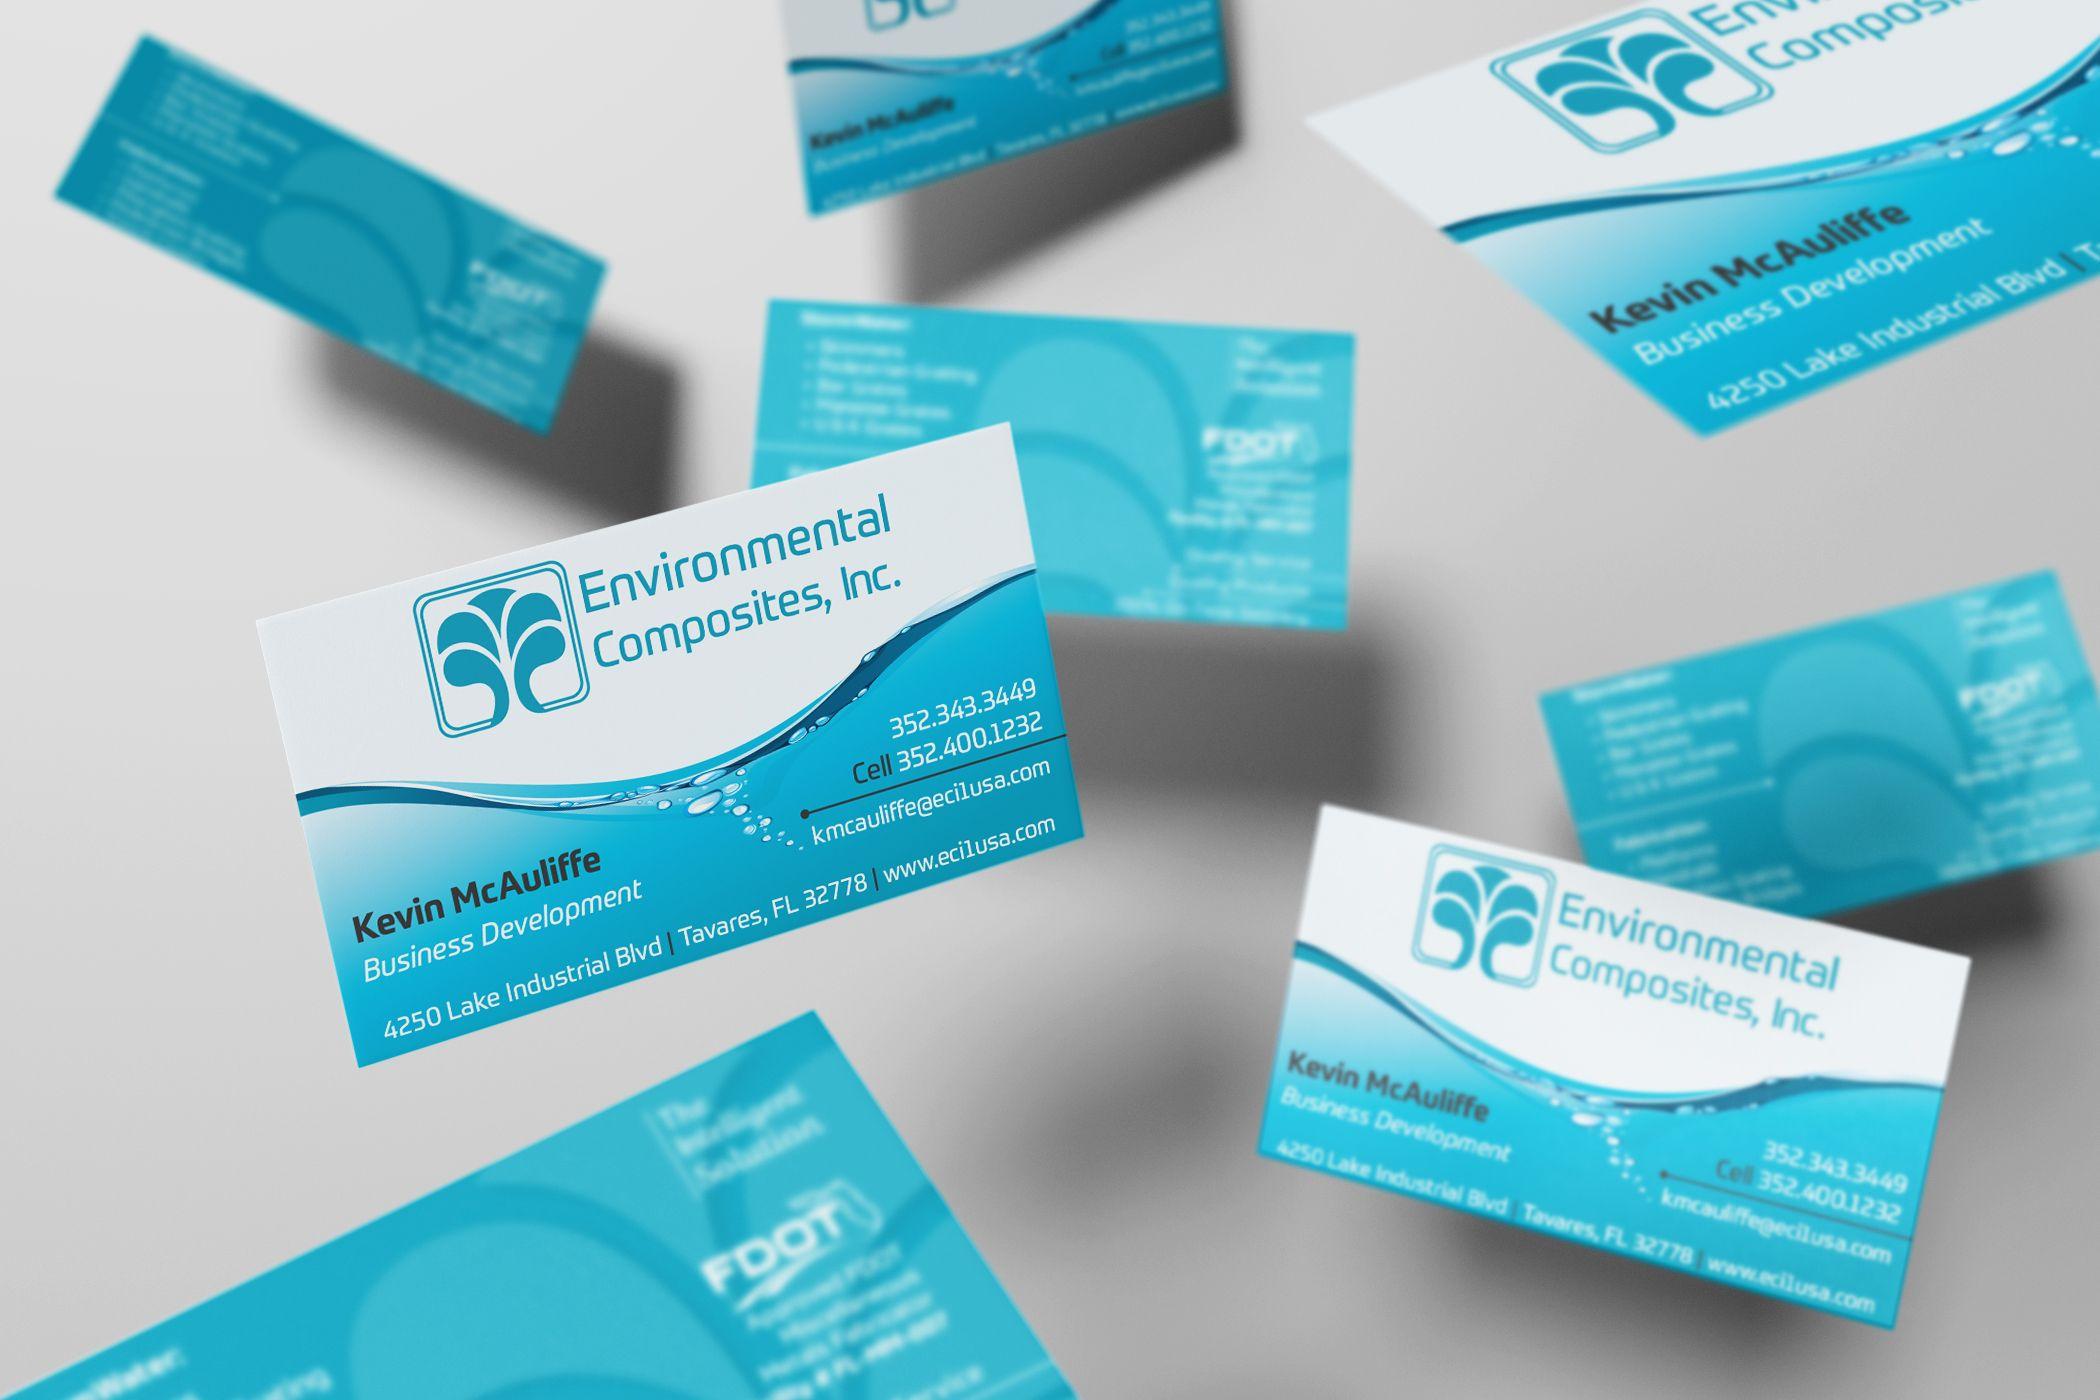 Manufacturing Business Card Design Melanyanndesigns Graphicdesign Businesscarddesign Businesscard Design Designer G Business Card Design Card Design Gum